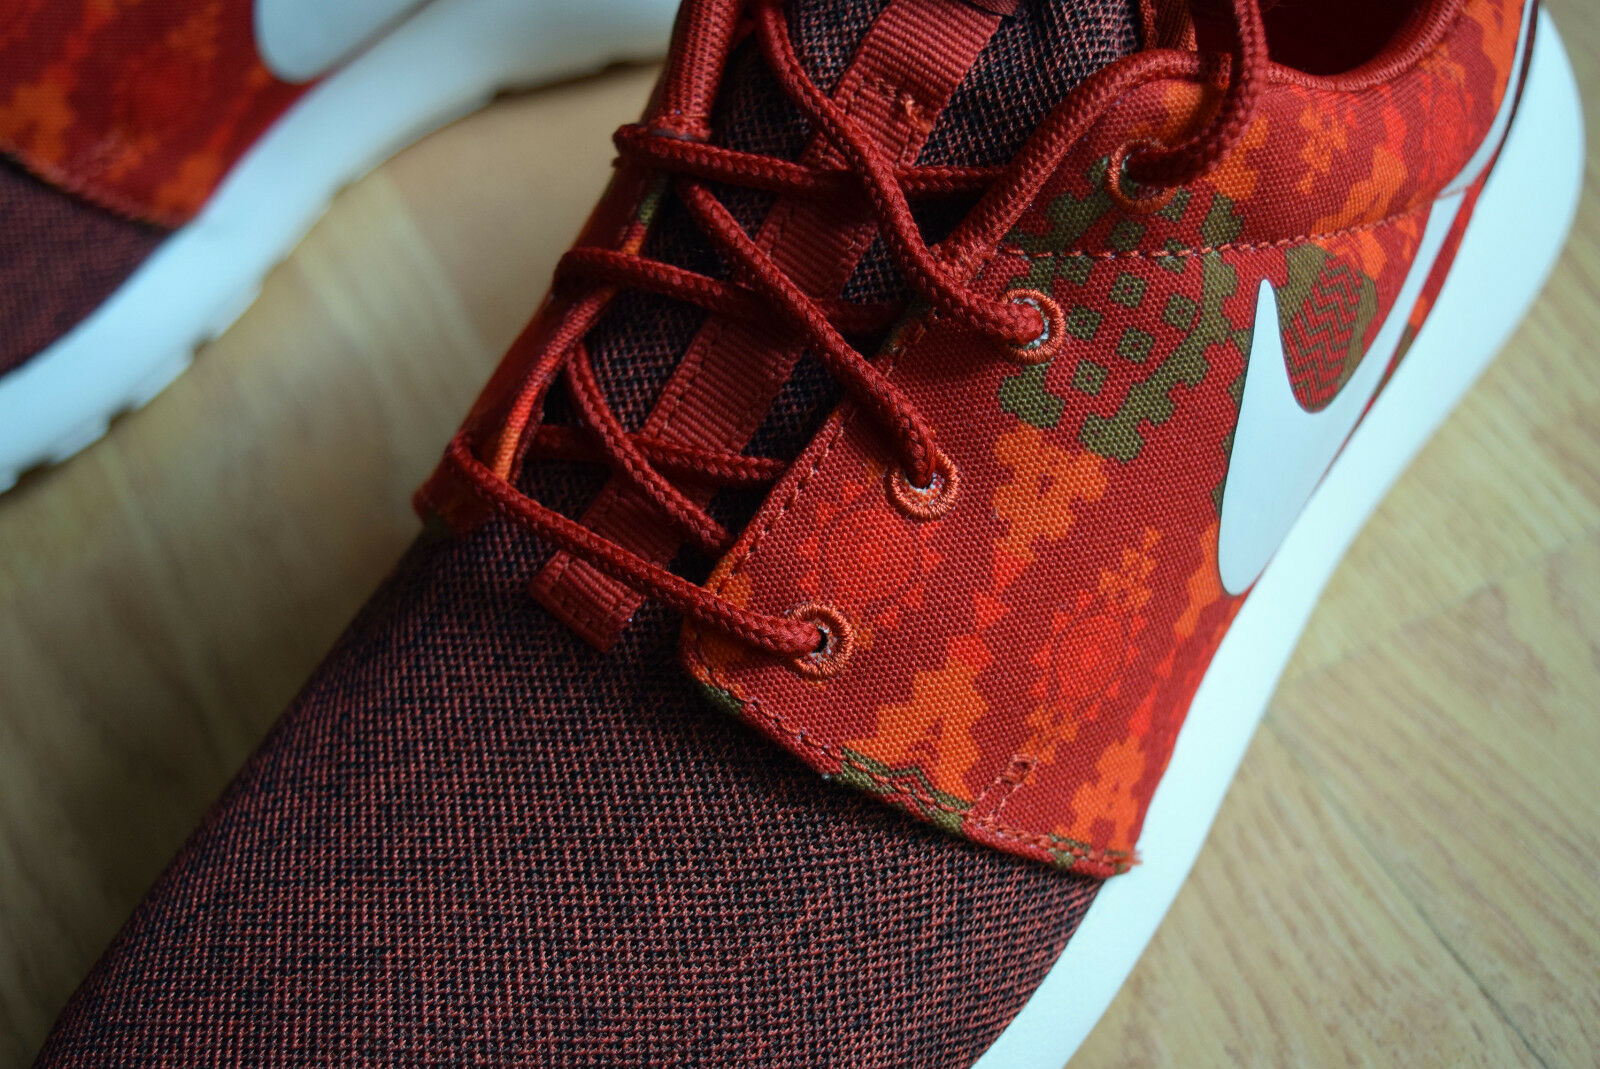 Nike Roshe One 41 42 43 44 45 45,5 Max Free Run Air Max 45,5 1 Tavas Presto 655206 612 47ef0f